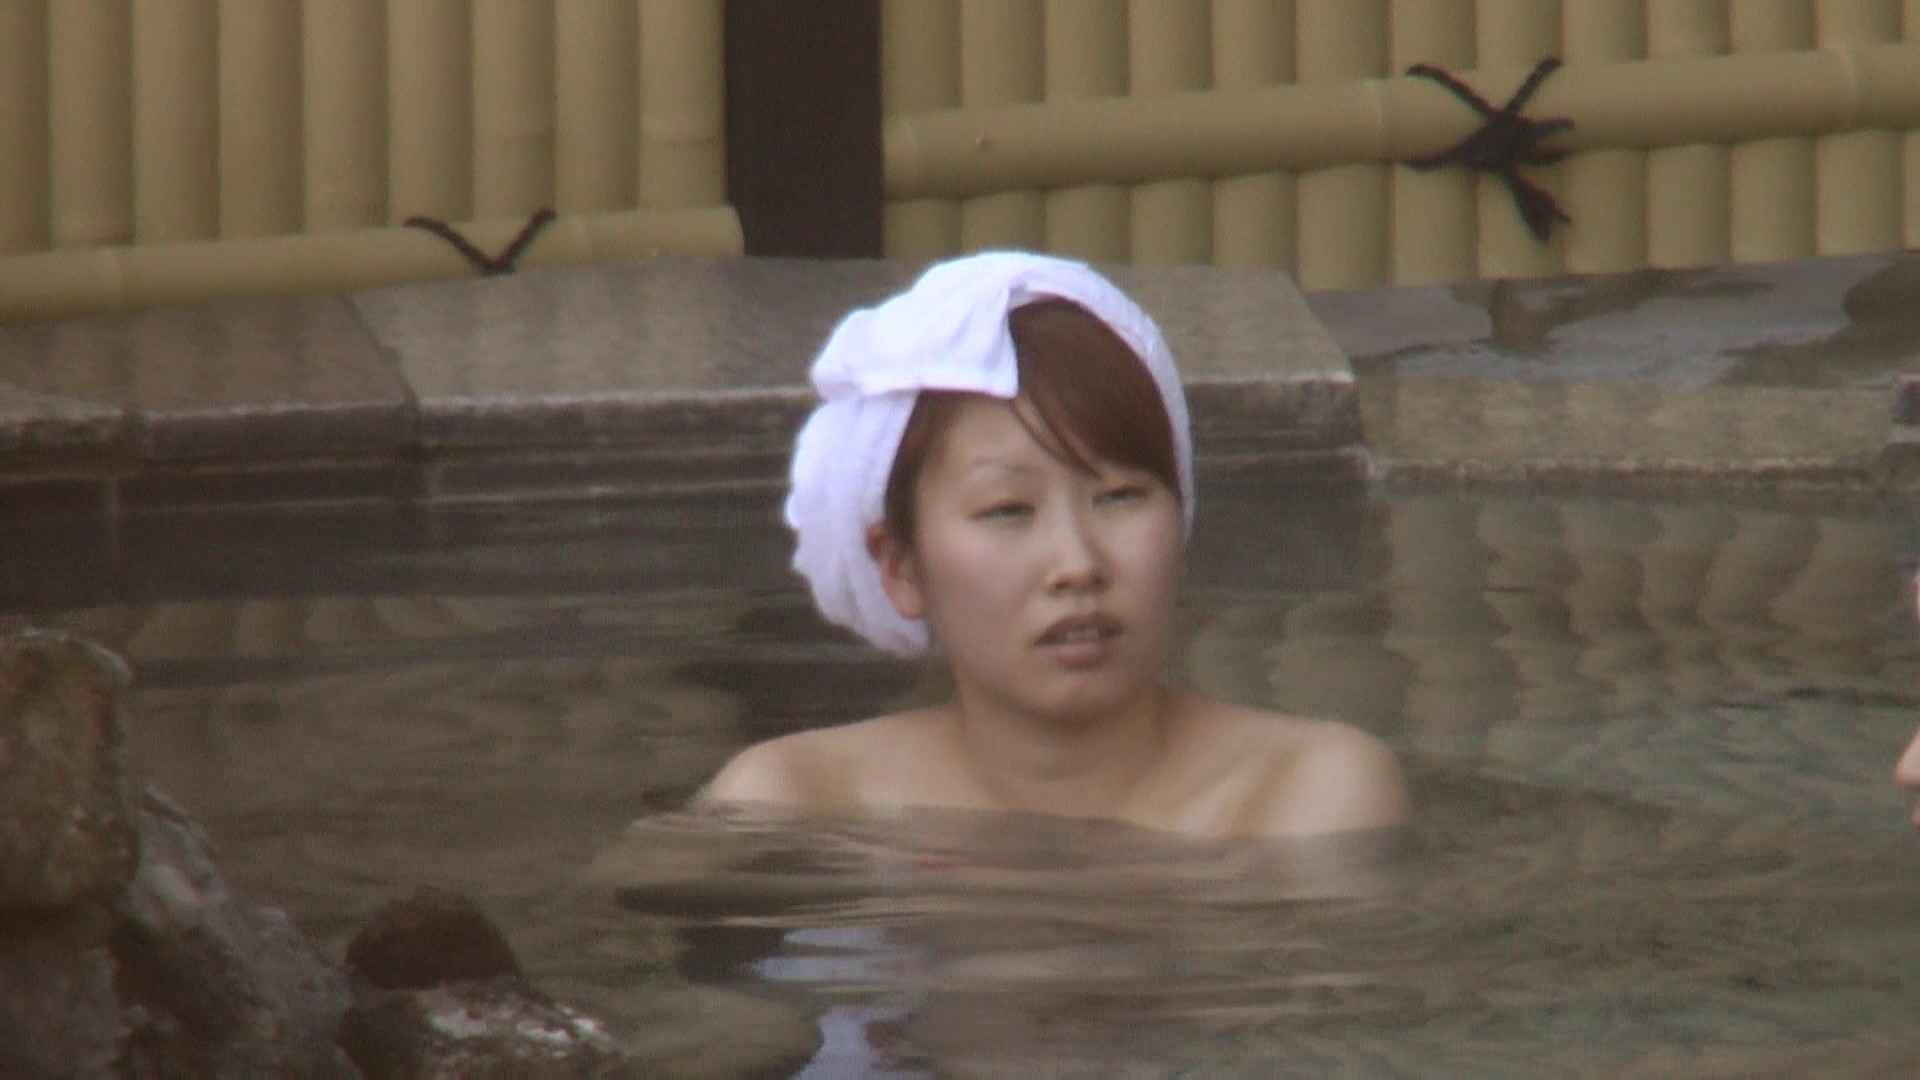 Aquaな露天風呂Vol.210 露天風呂 ワレメ動画紹介 83連発 53